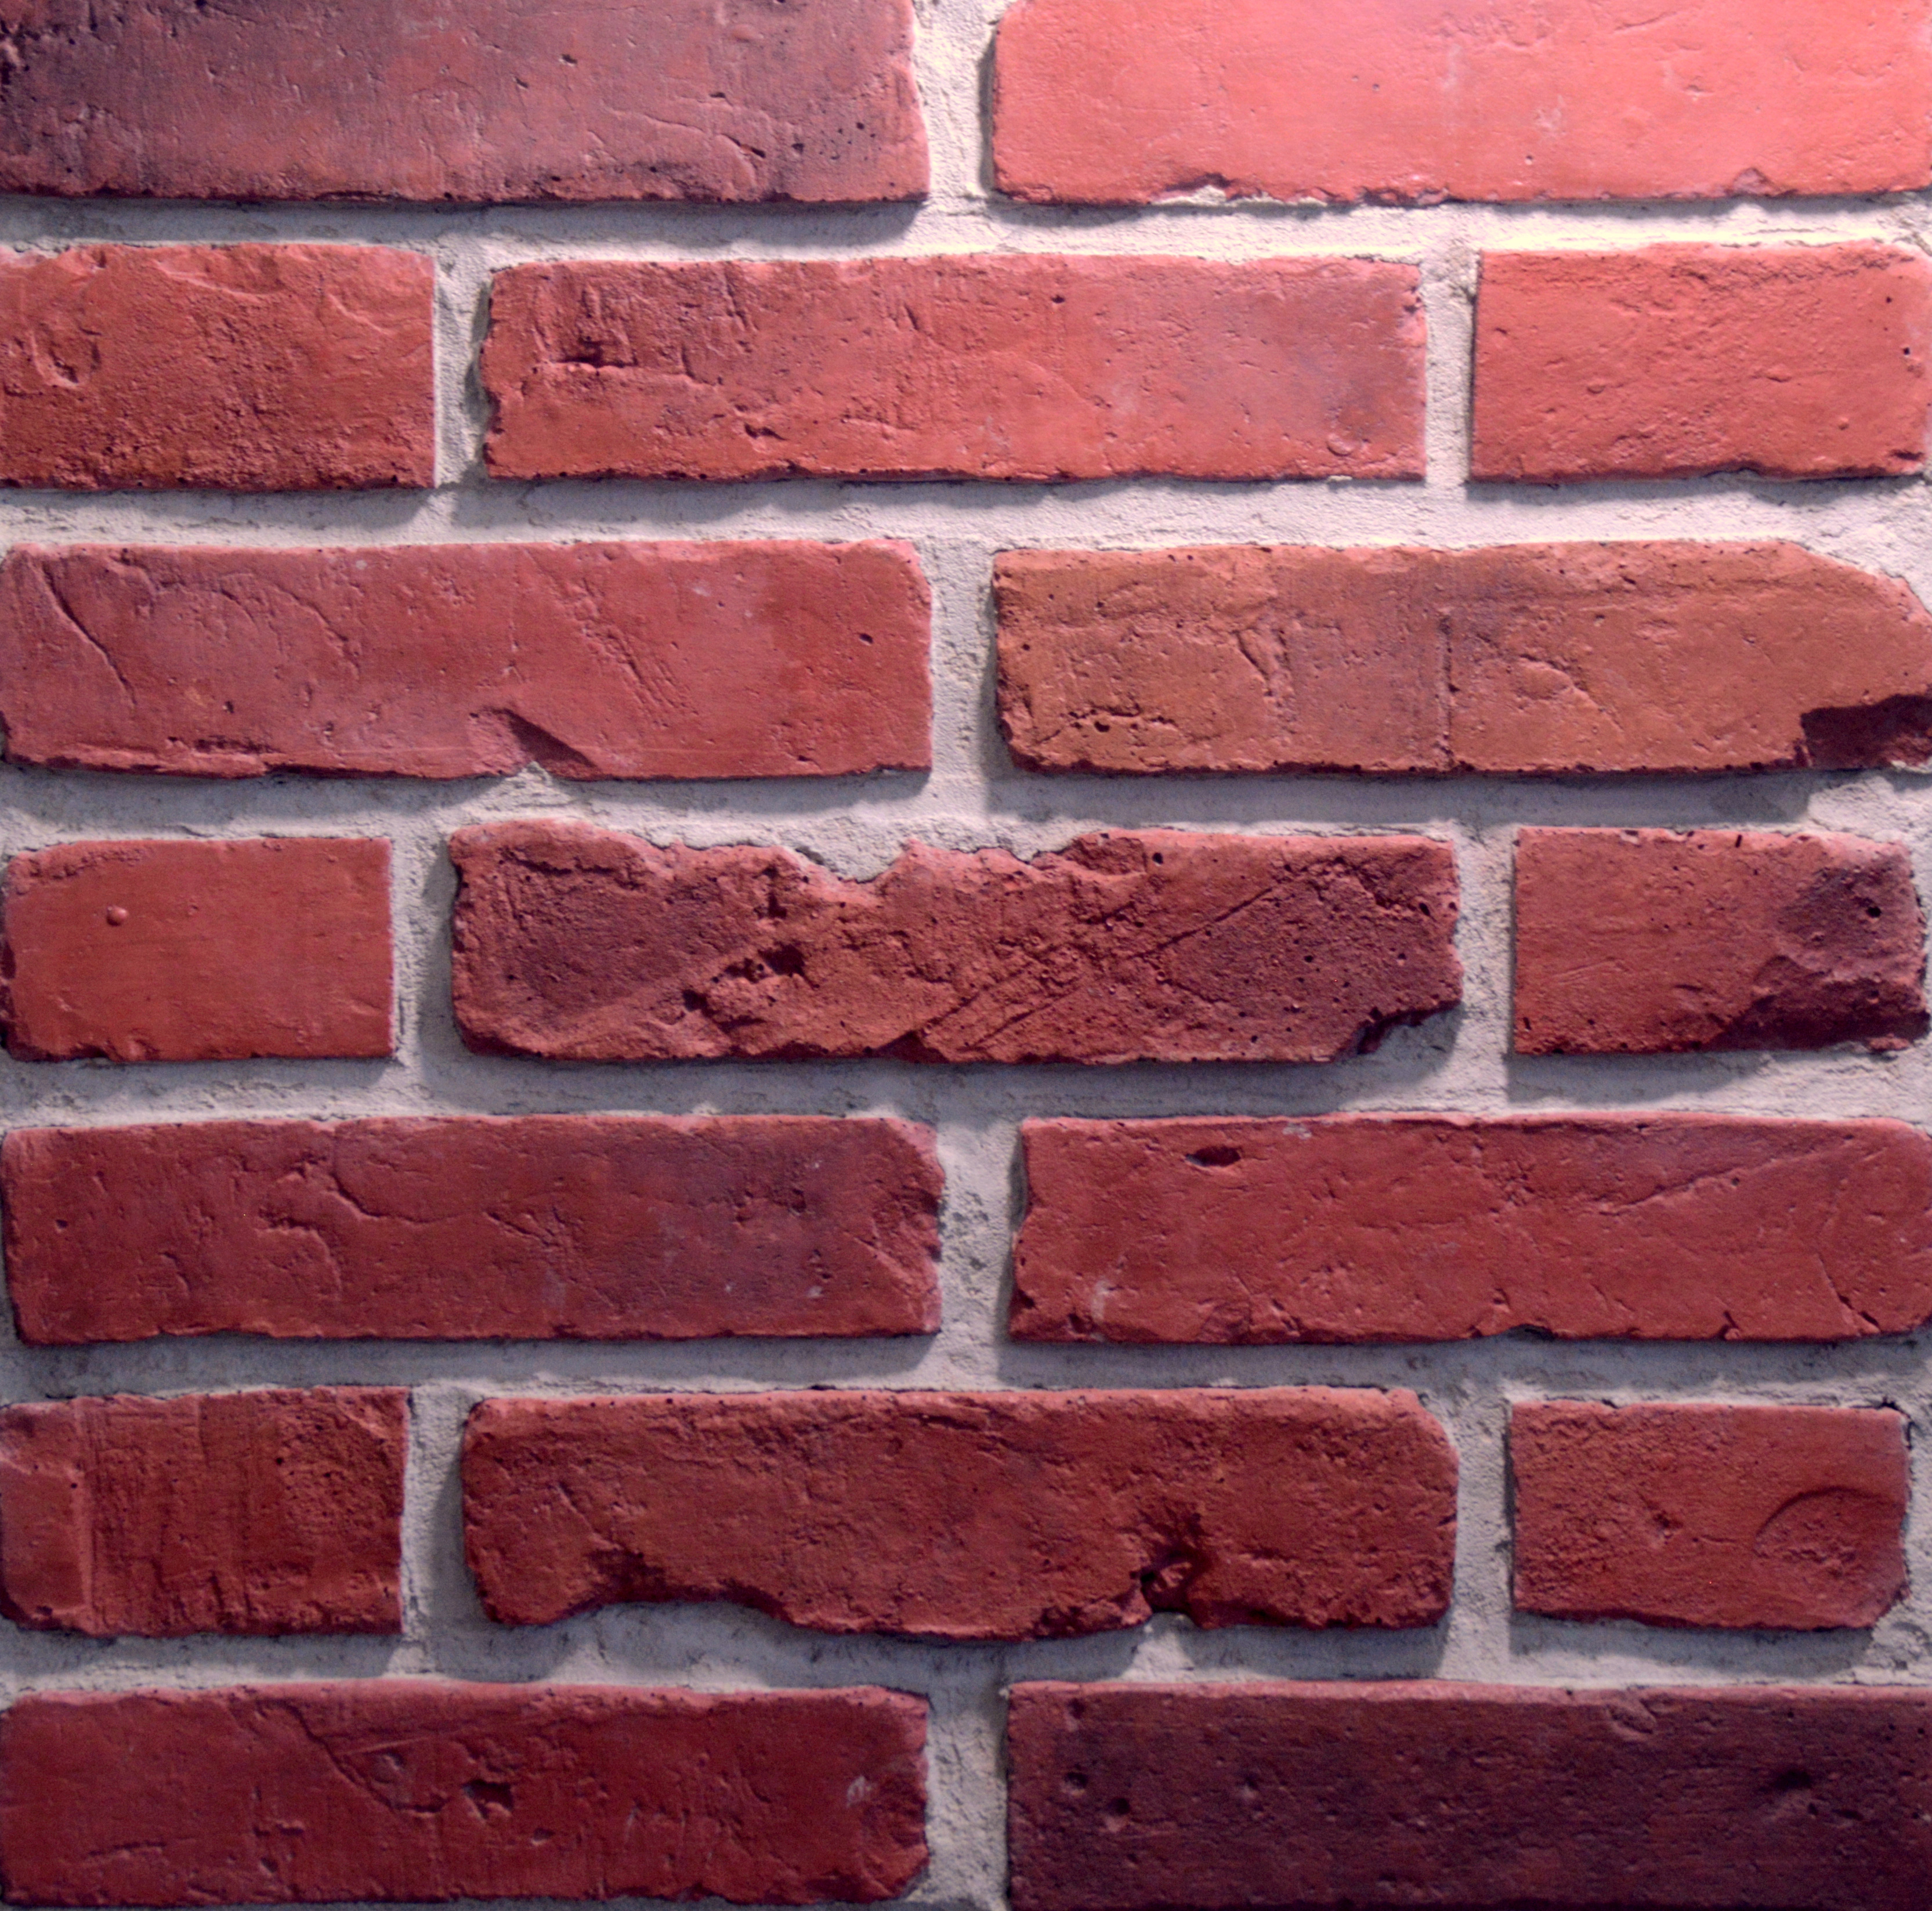 Plytka Stara Cegla Gotycka Opak 0 46 M2 Stig Wall